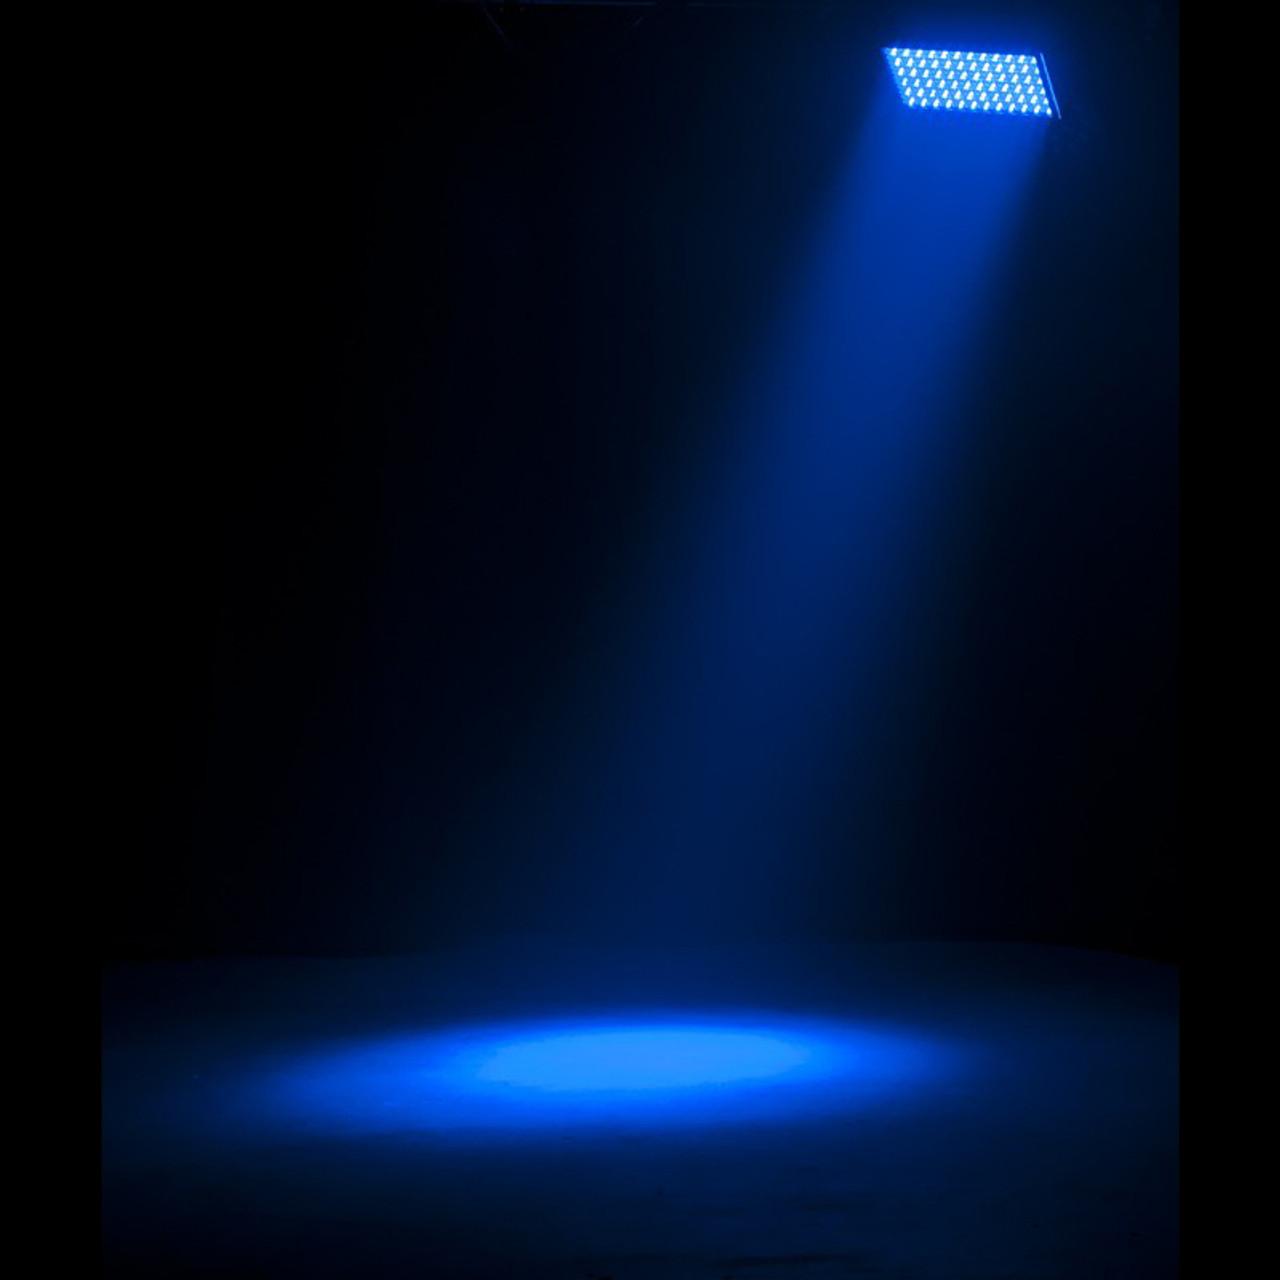 ADJ Profile Panel RGBA LED Color Wash Panel Light